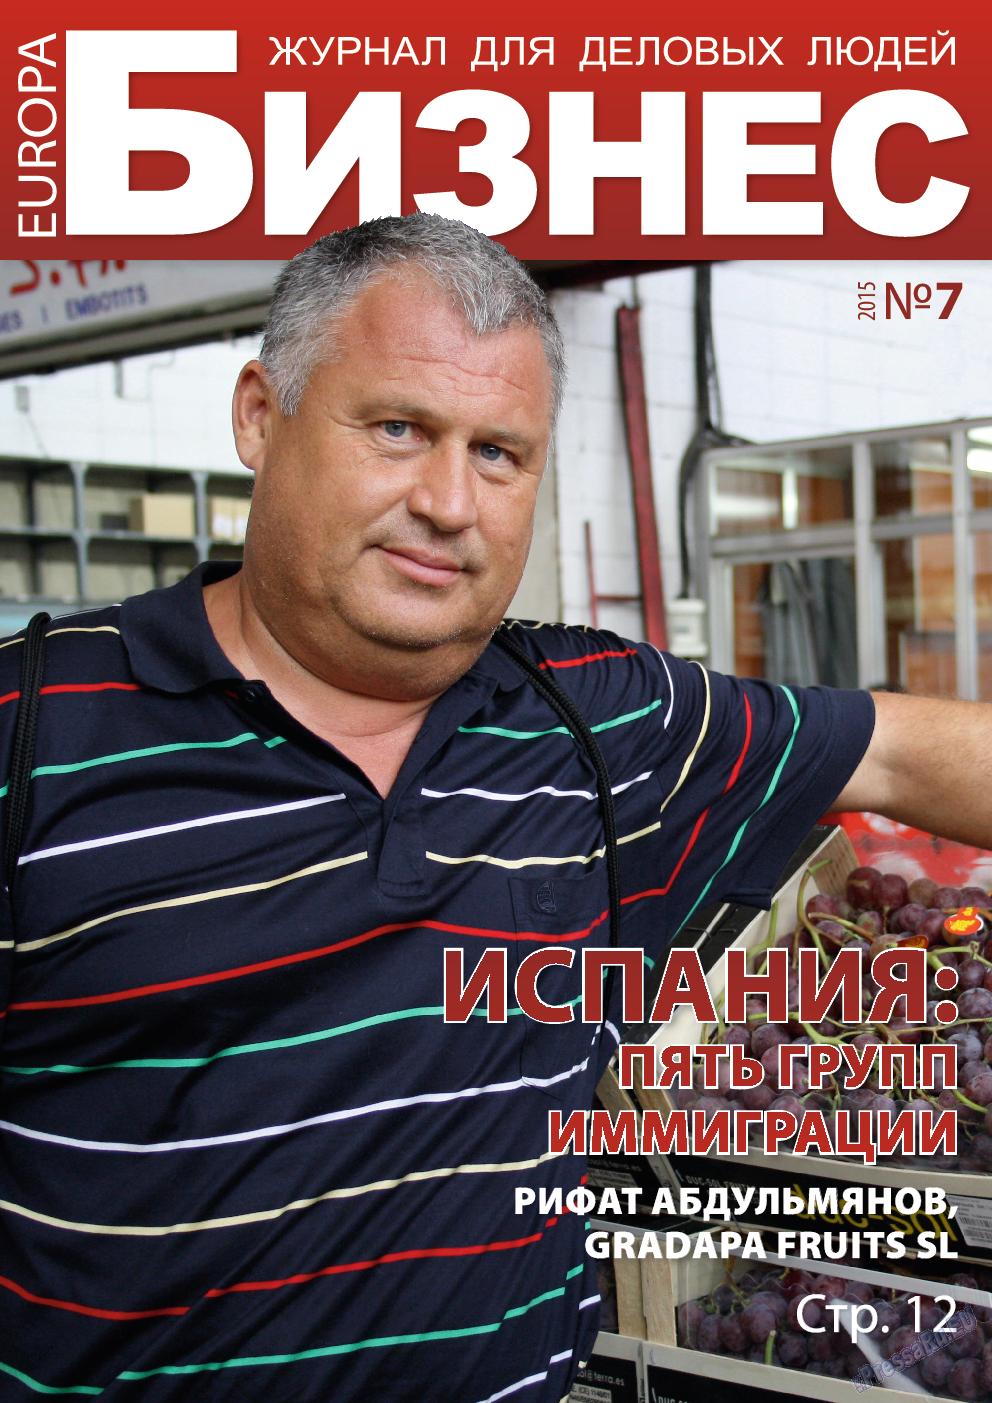 Бизнес (журнал). 2015 год, номер 7, стр. 1